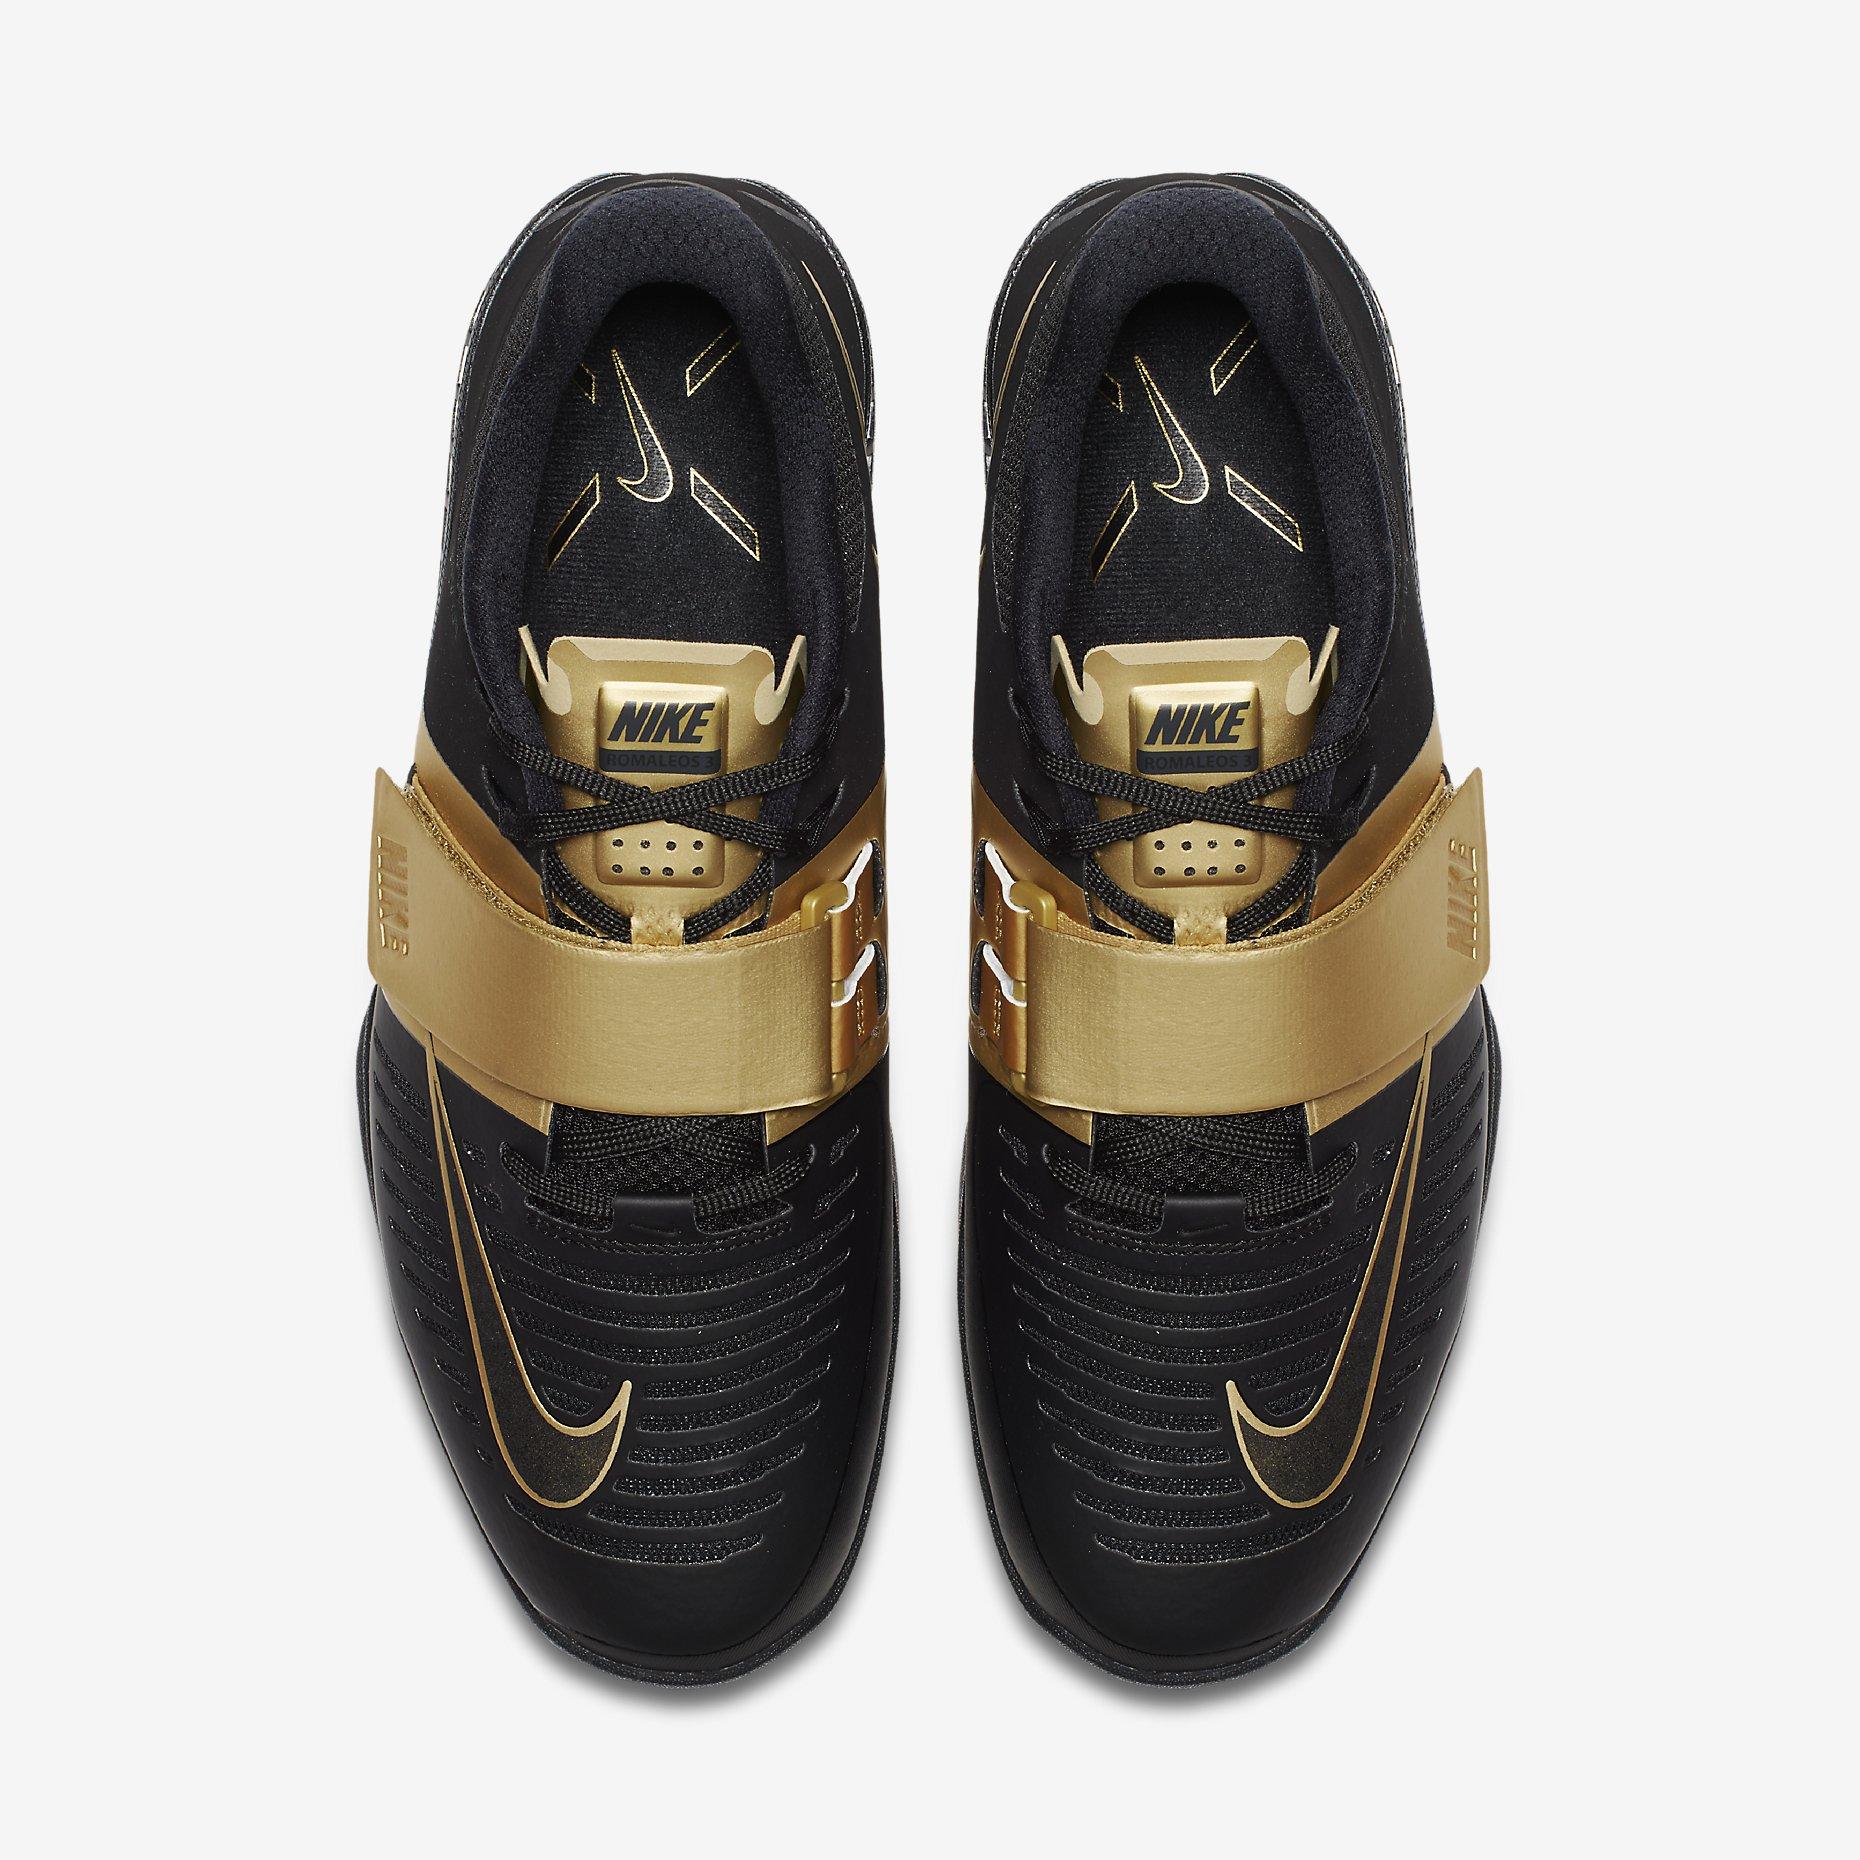 romaleos-3-x-mens-training-shoe (3)